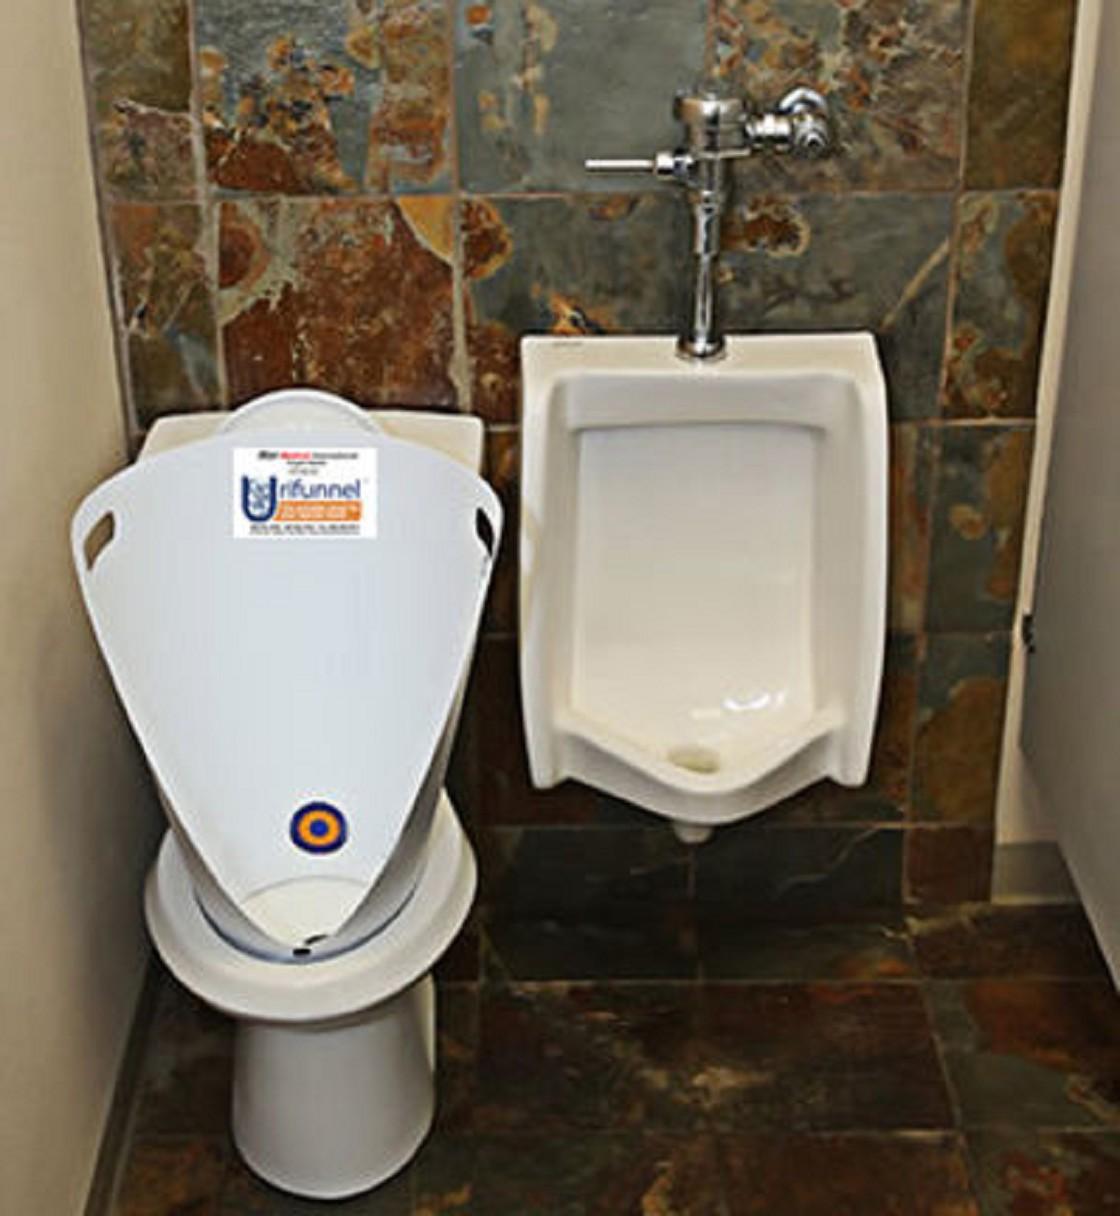 Toilet seat riser drive medical - Amazoncom Drive Medical Padded Raised Toilet Seat Riser Shop